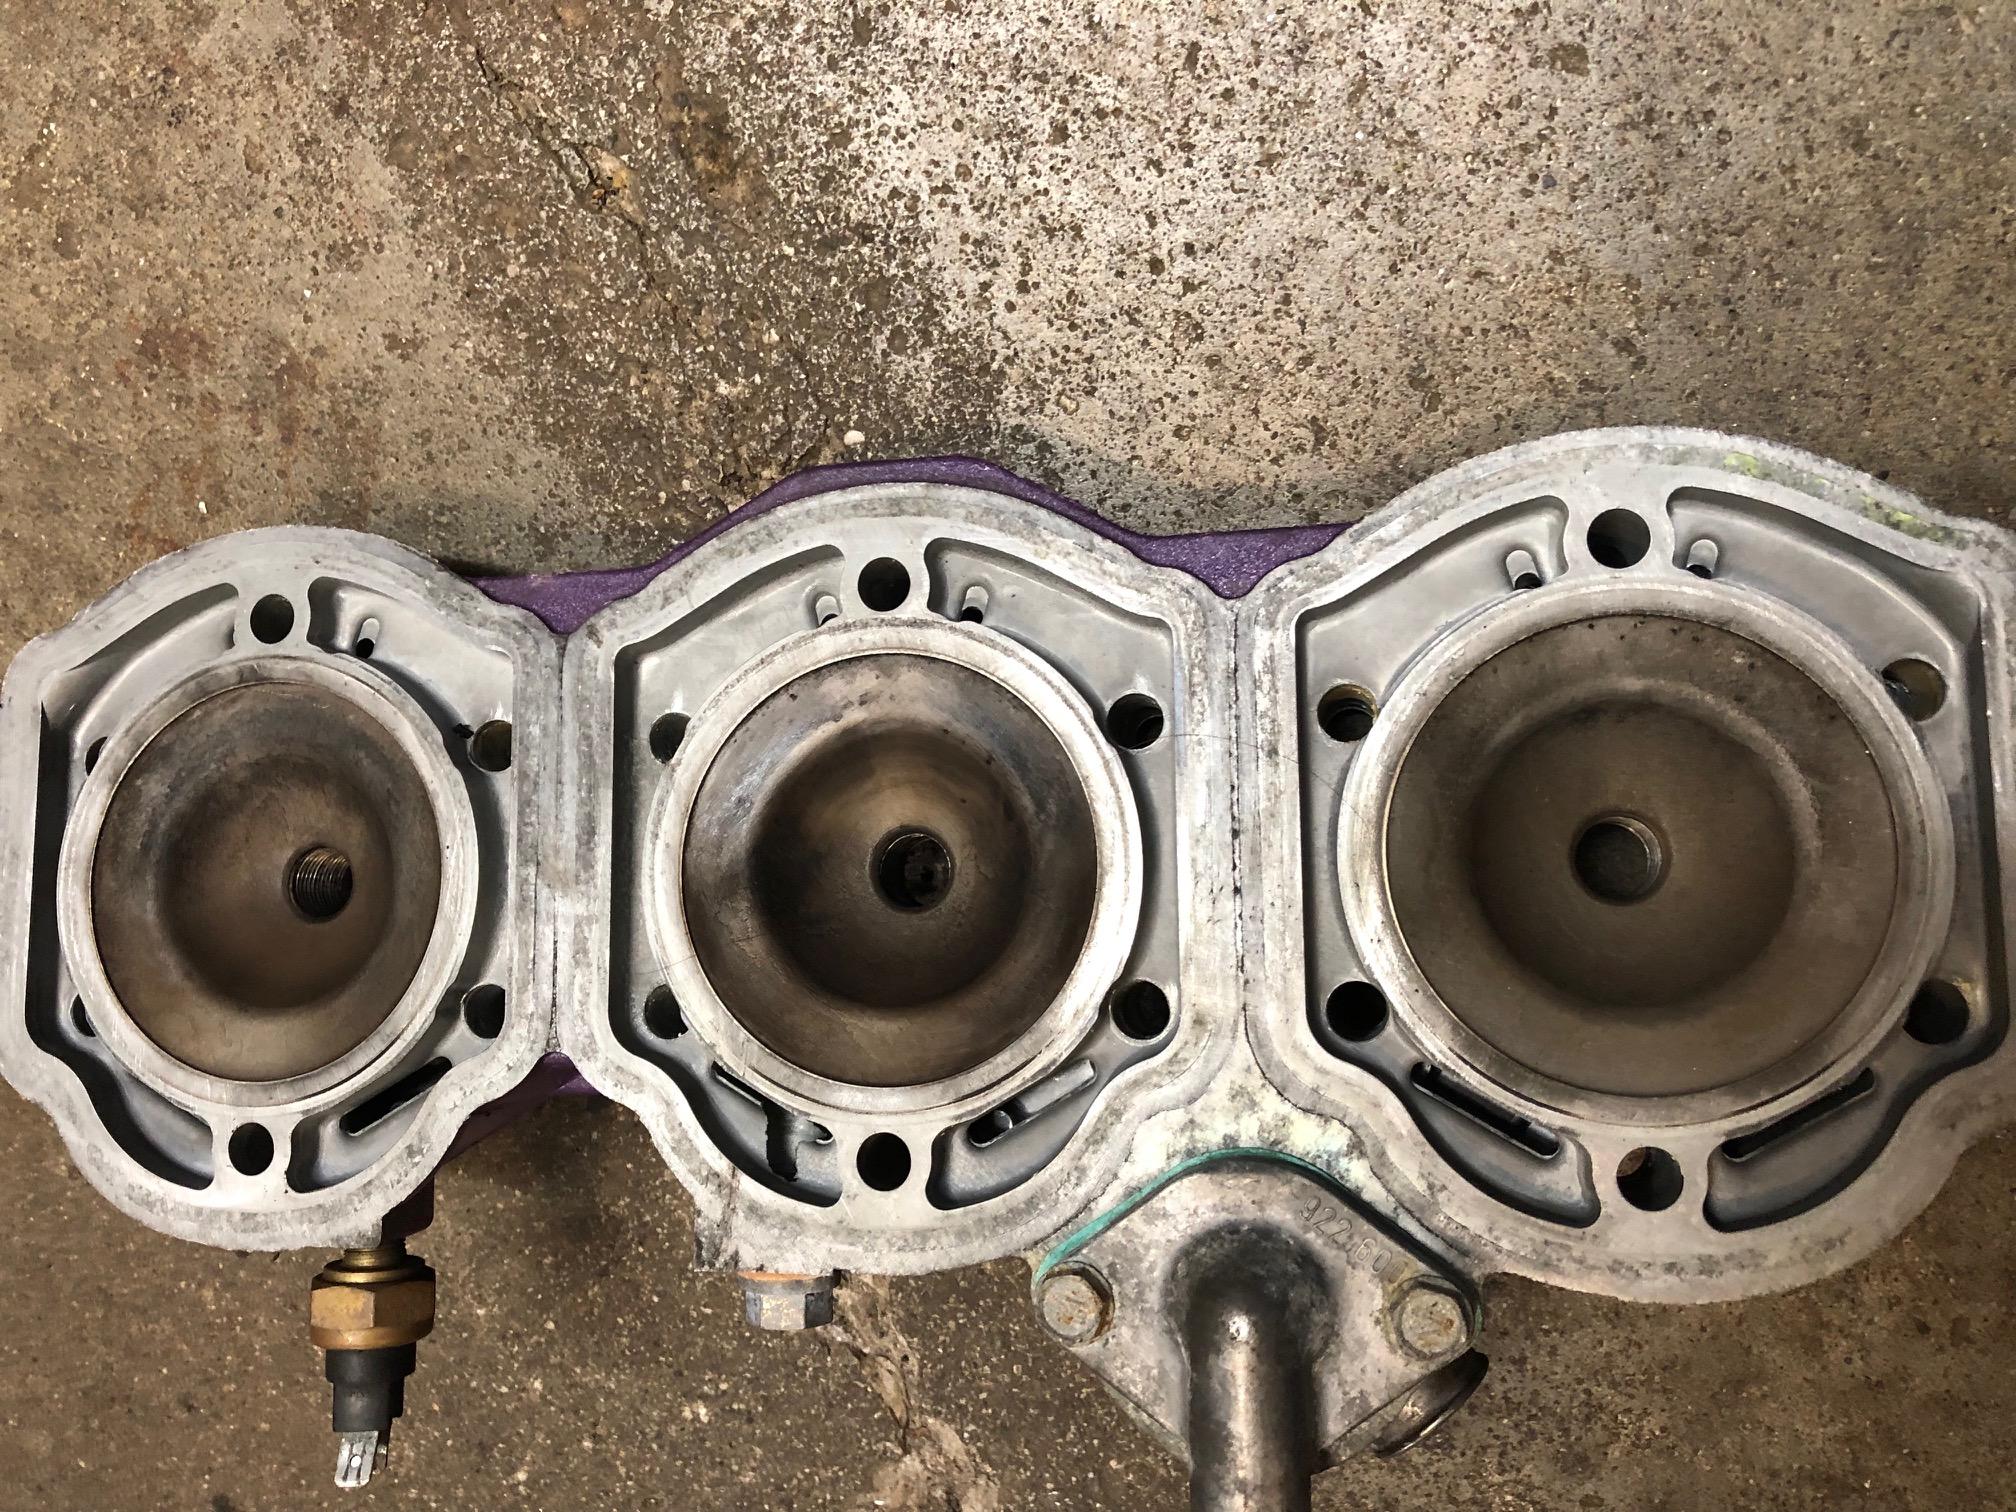 1998 Mach 1 700 cylinder head